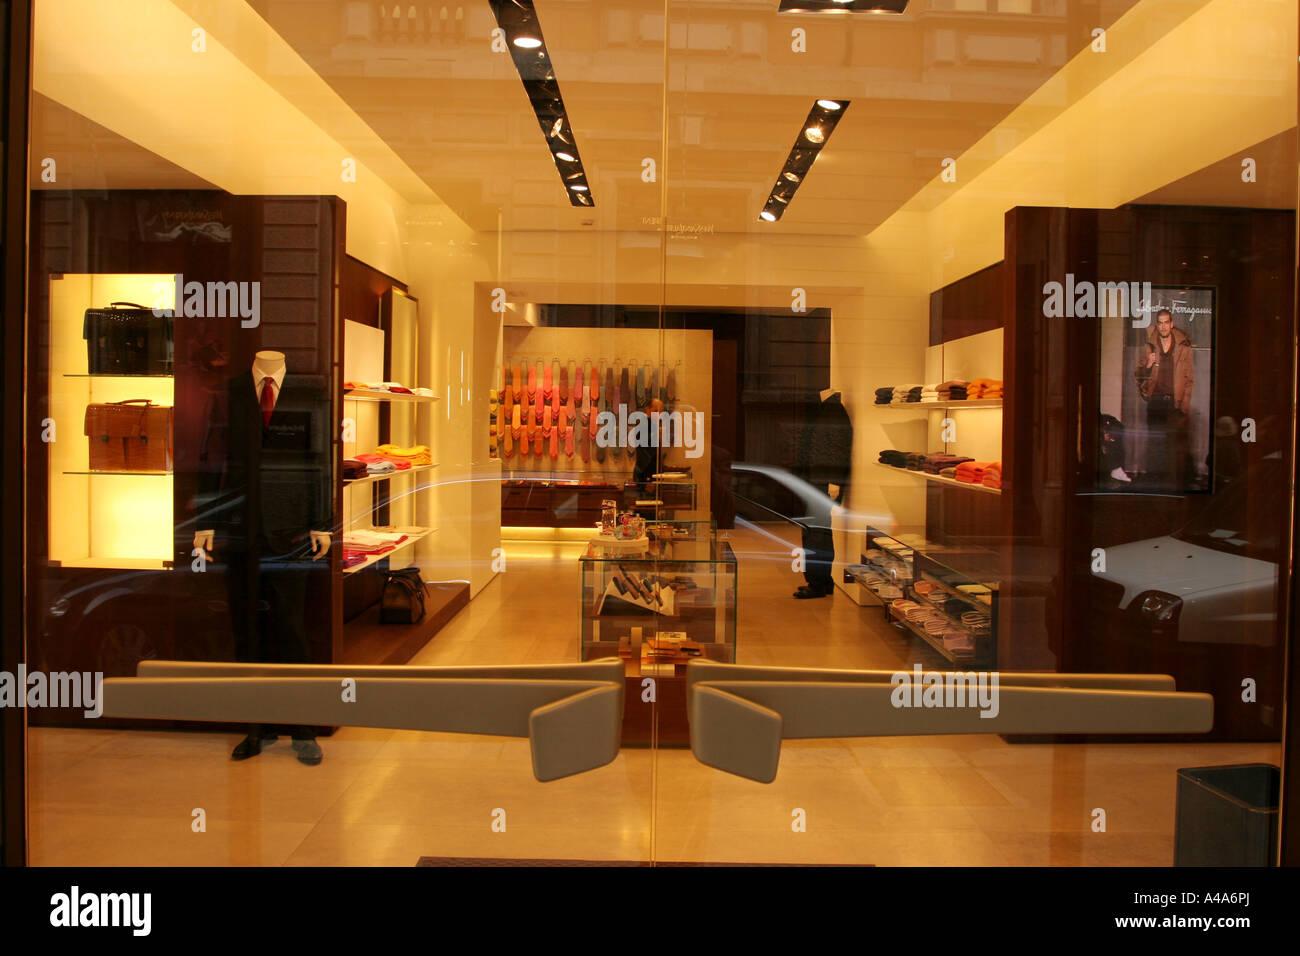 Salvatore Ferragamo shop Monte Napoleone street Milan Lombardy ITaly - Stock Image